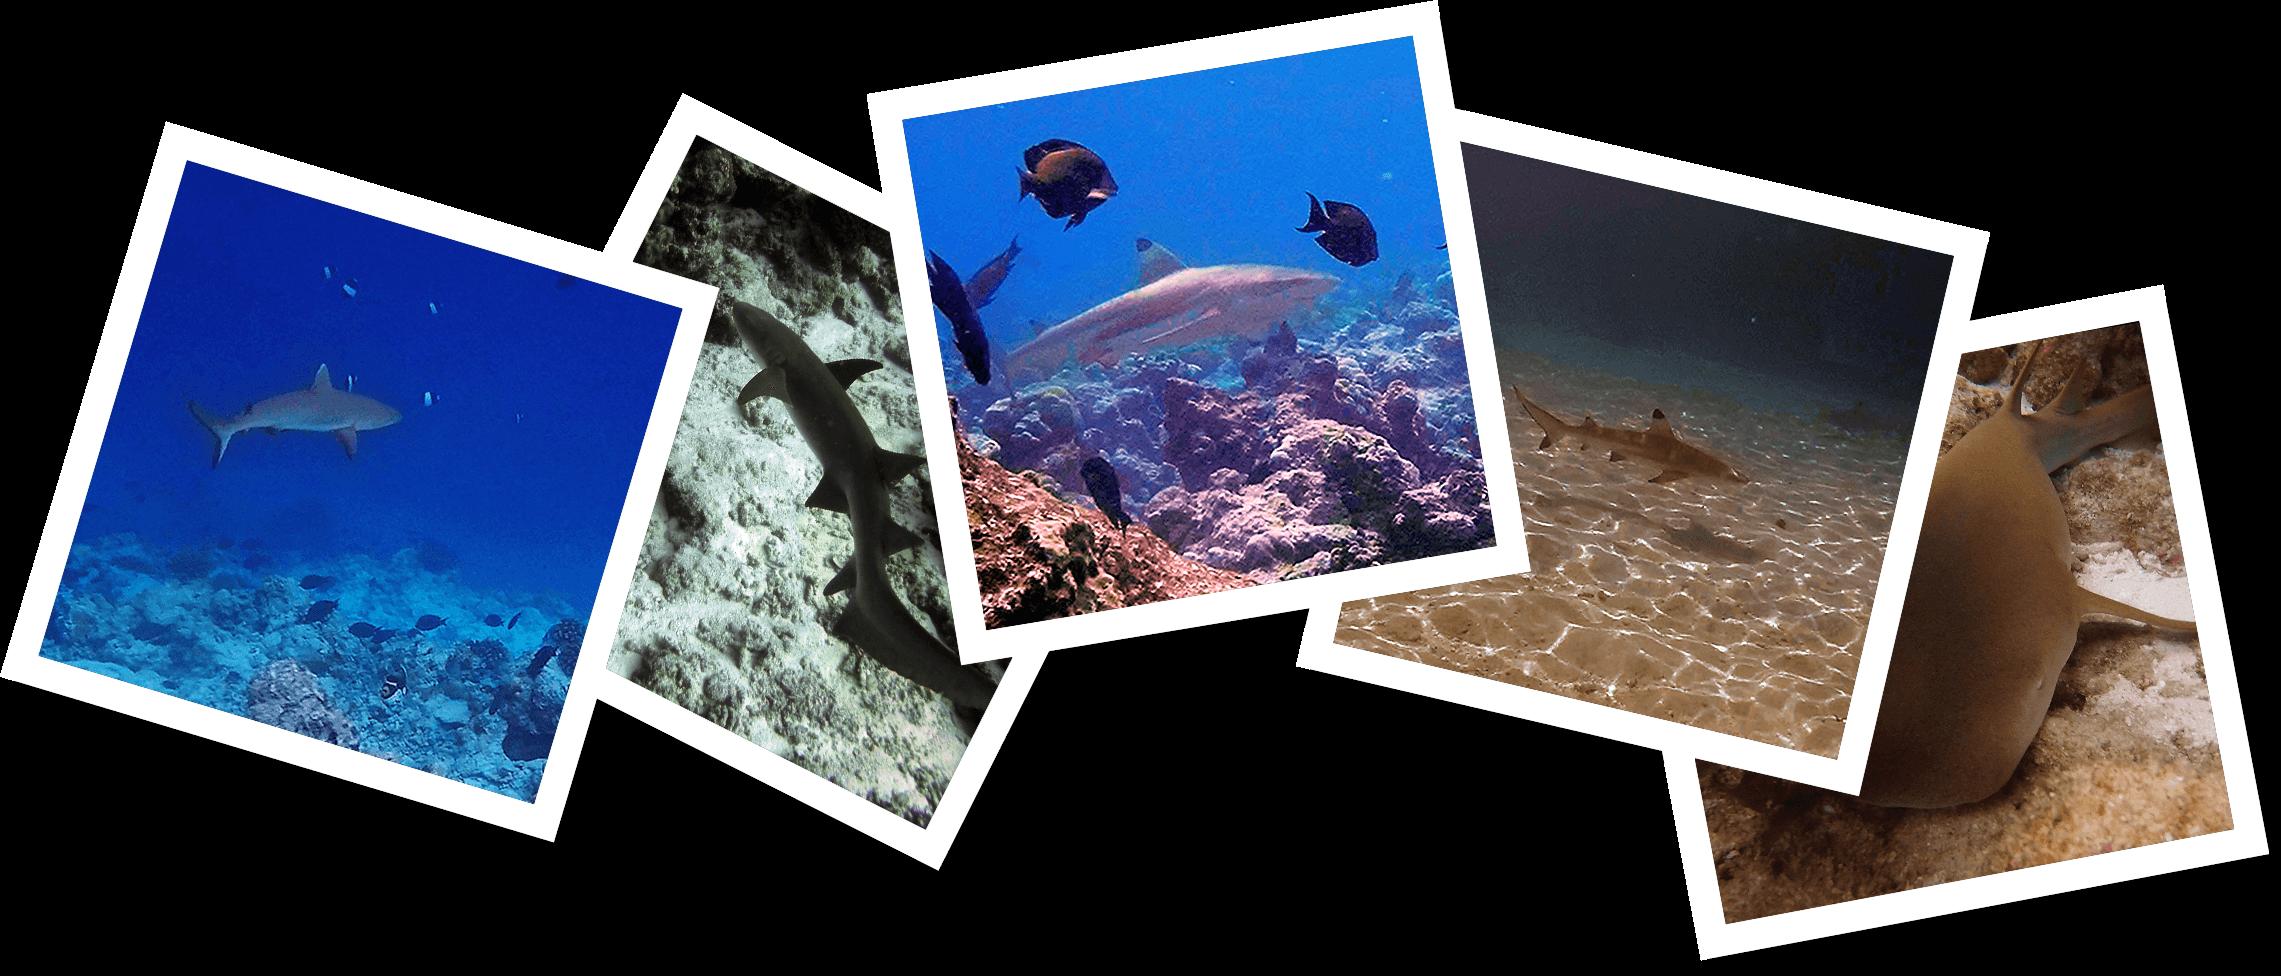 Marine biology internship Maldives – Thije (3)c